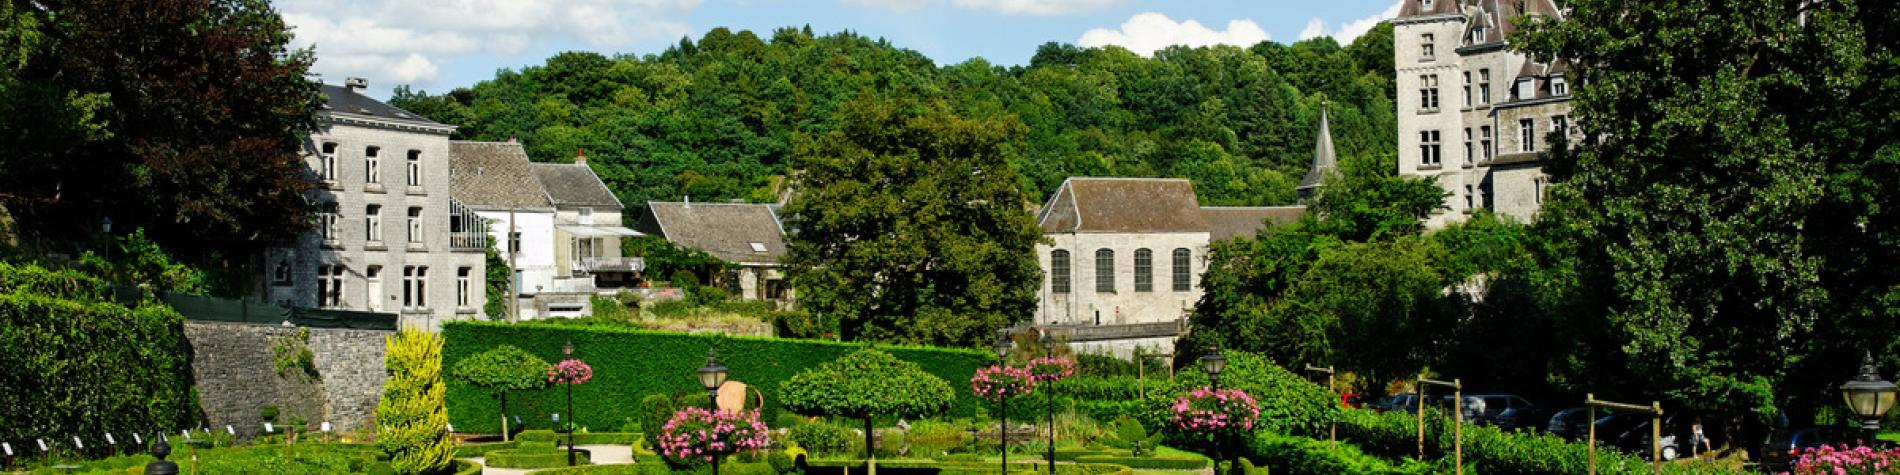 Topiary Park - Durbuy